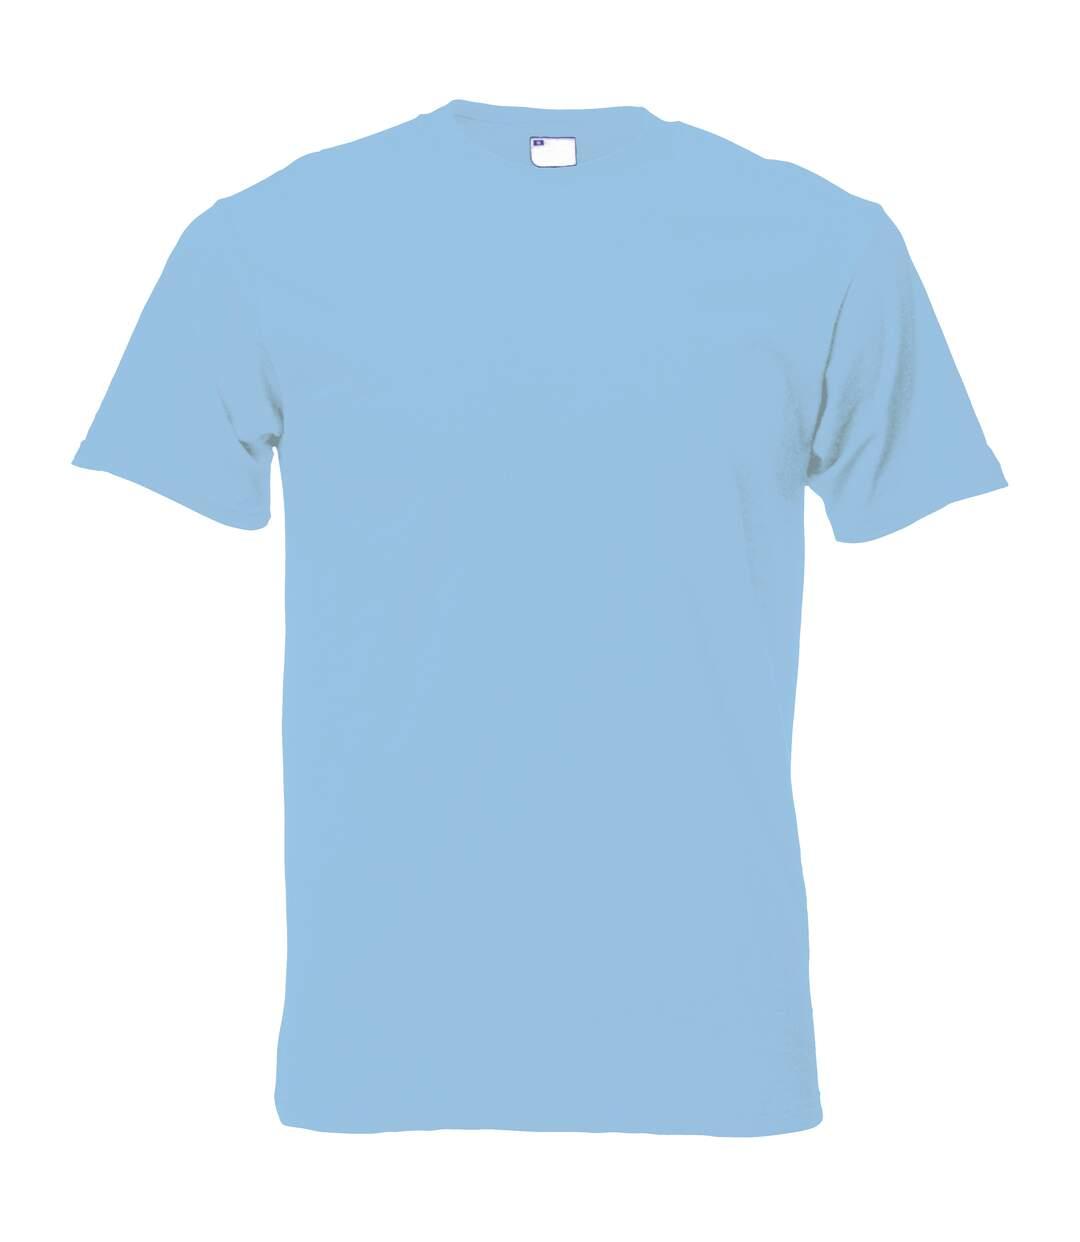 Mens Short Sleeve Casual T-Shirt (Light Blue) - UTBC3904